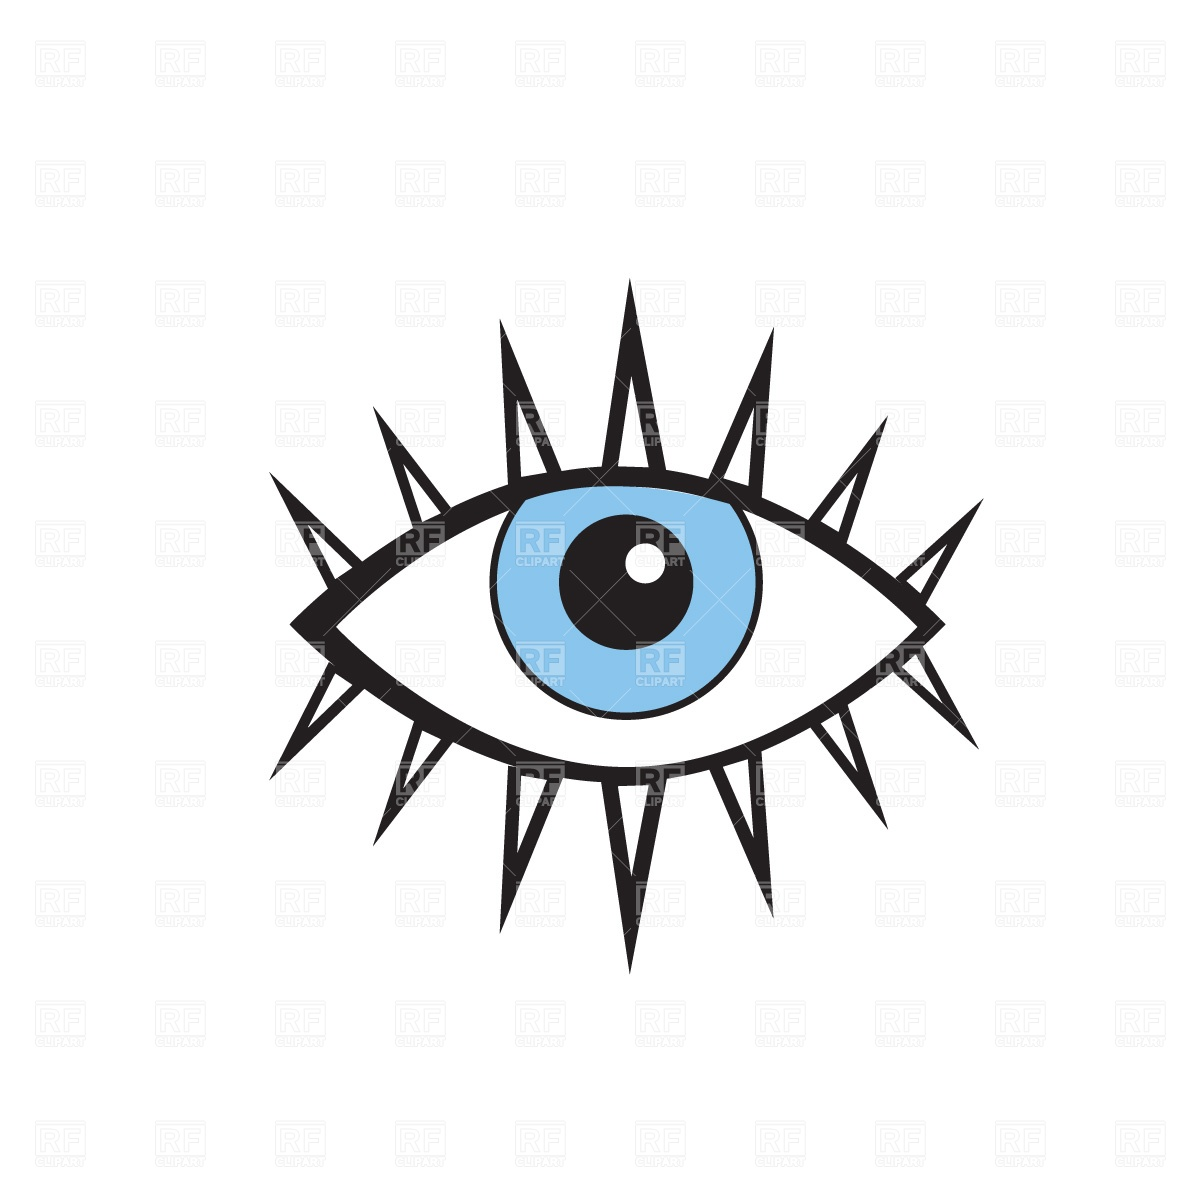 1200x1200 Stylish Human Eye Free Vector Clip Art Image